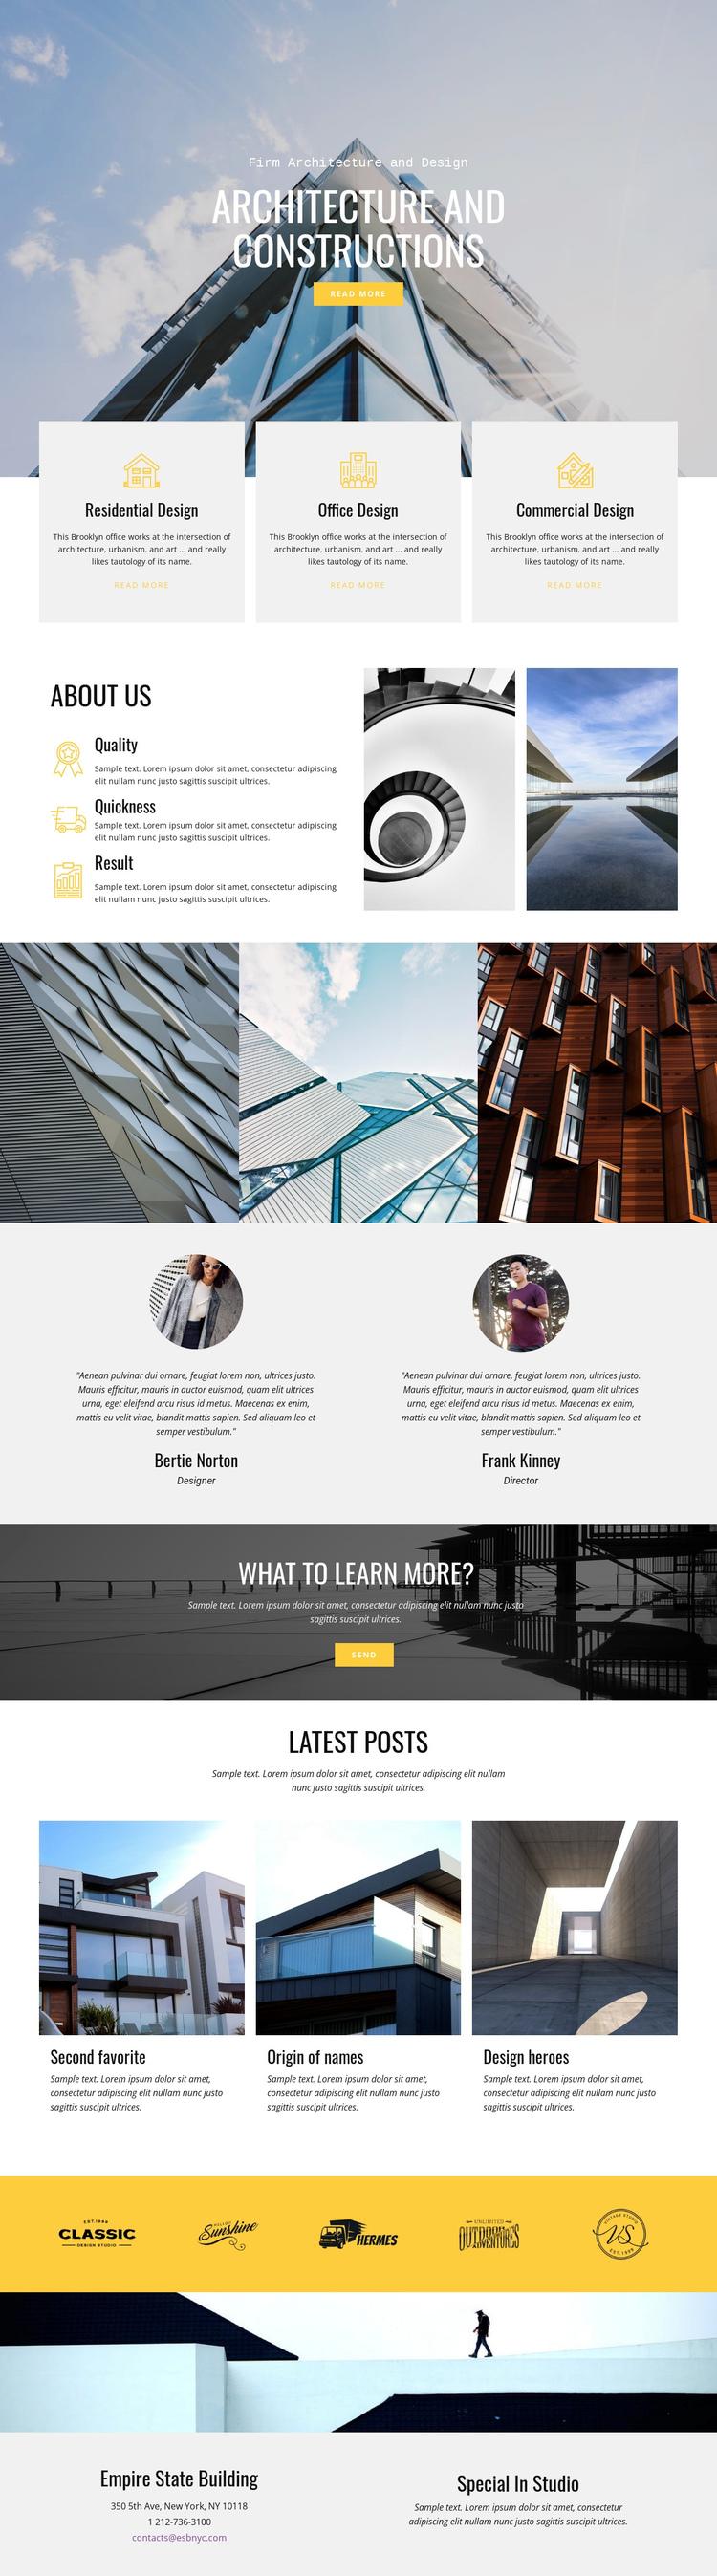 Constructive architecture Website Builder Software